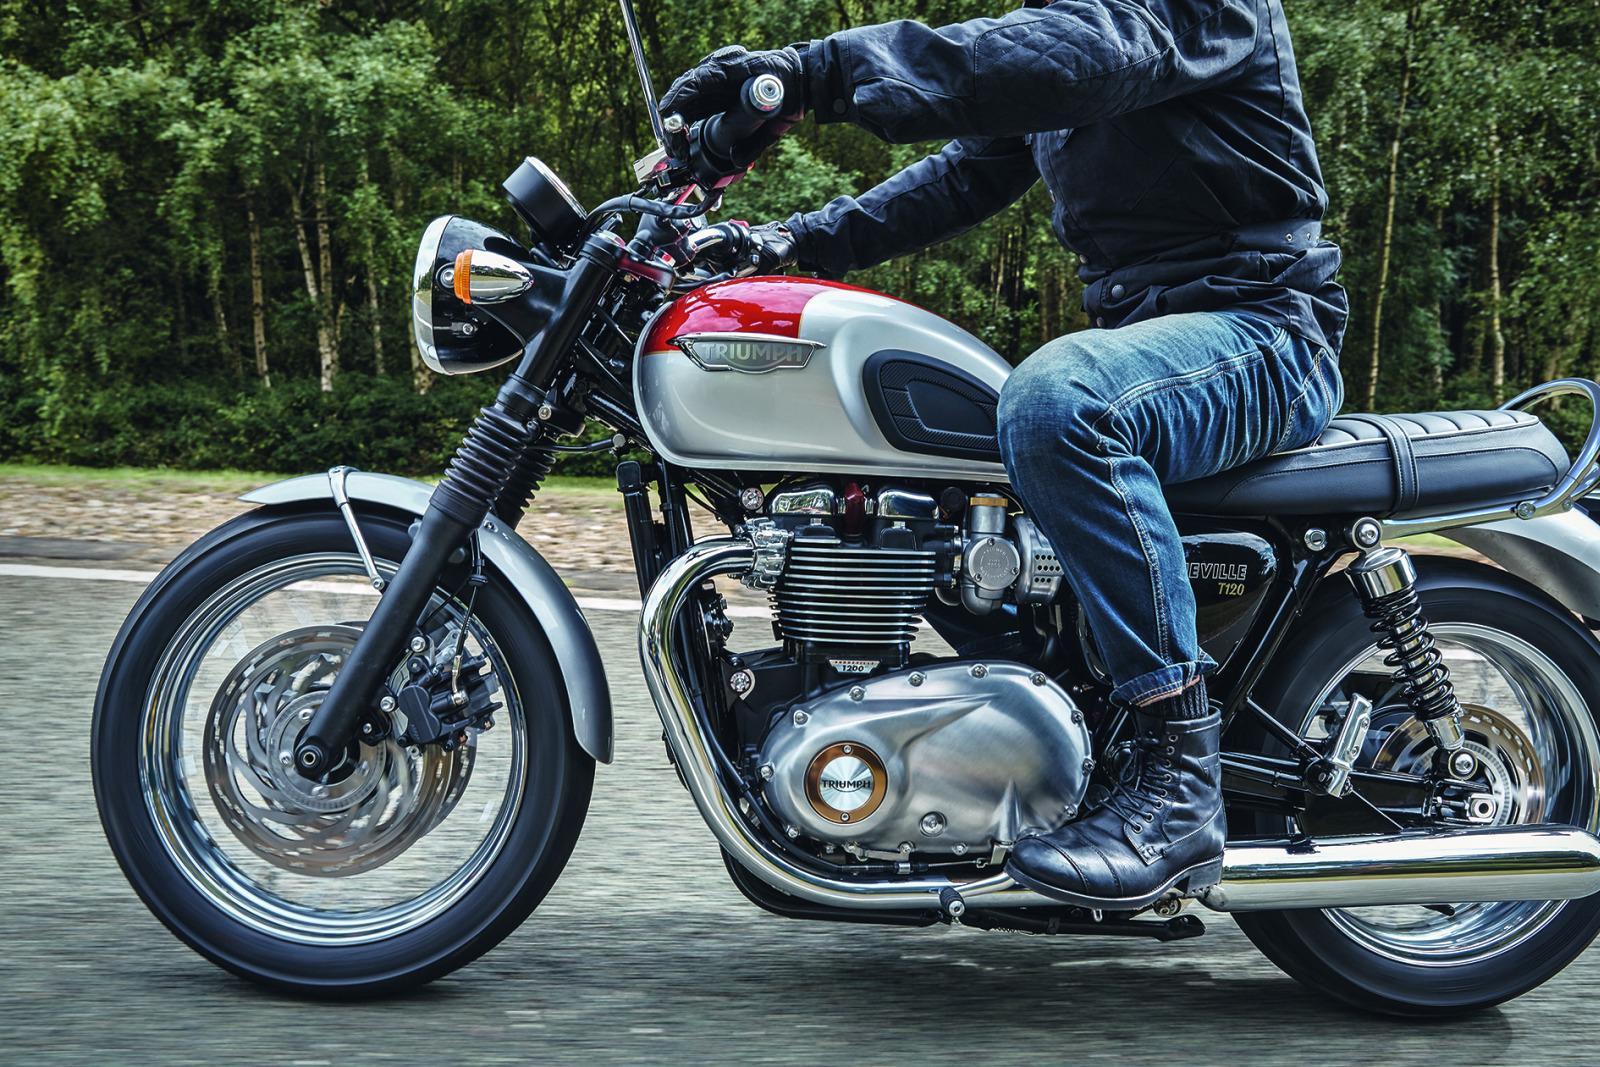 triumph bonneville t120 und t120 black 2016 motorrad fotos motorrad bilder. Black Bedroom Furniture Sets. Home Design Ideas